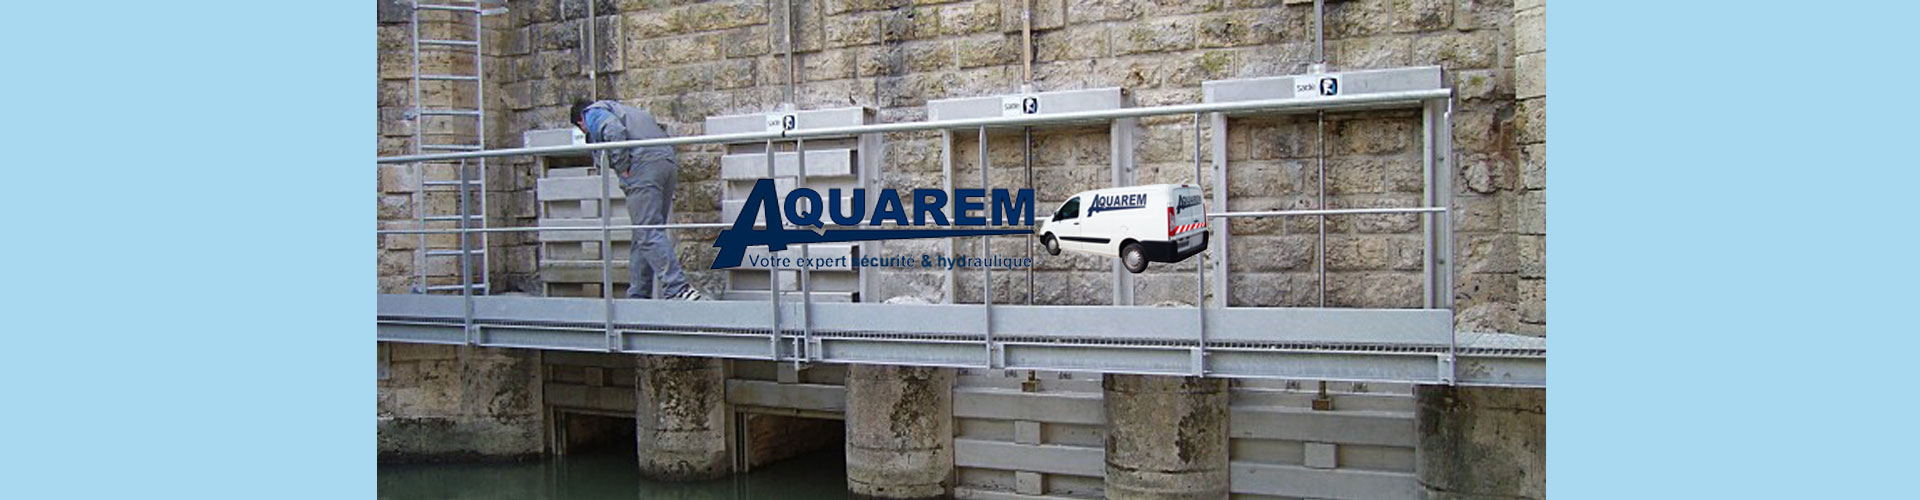 Aquarem